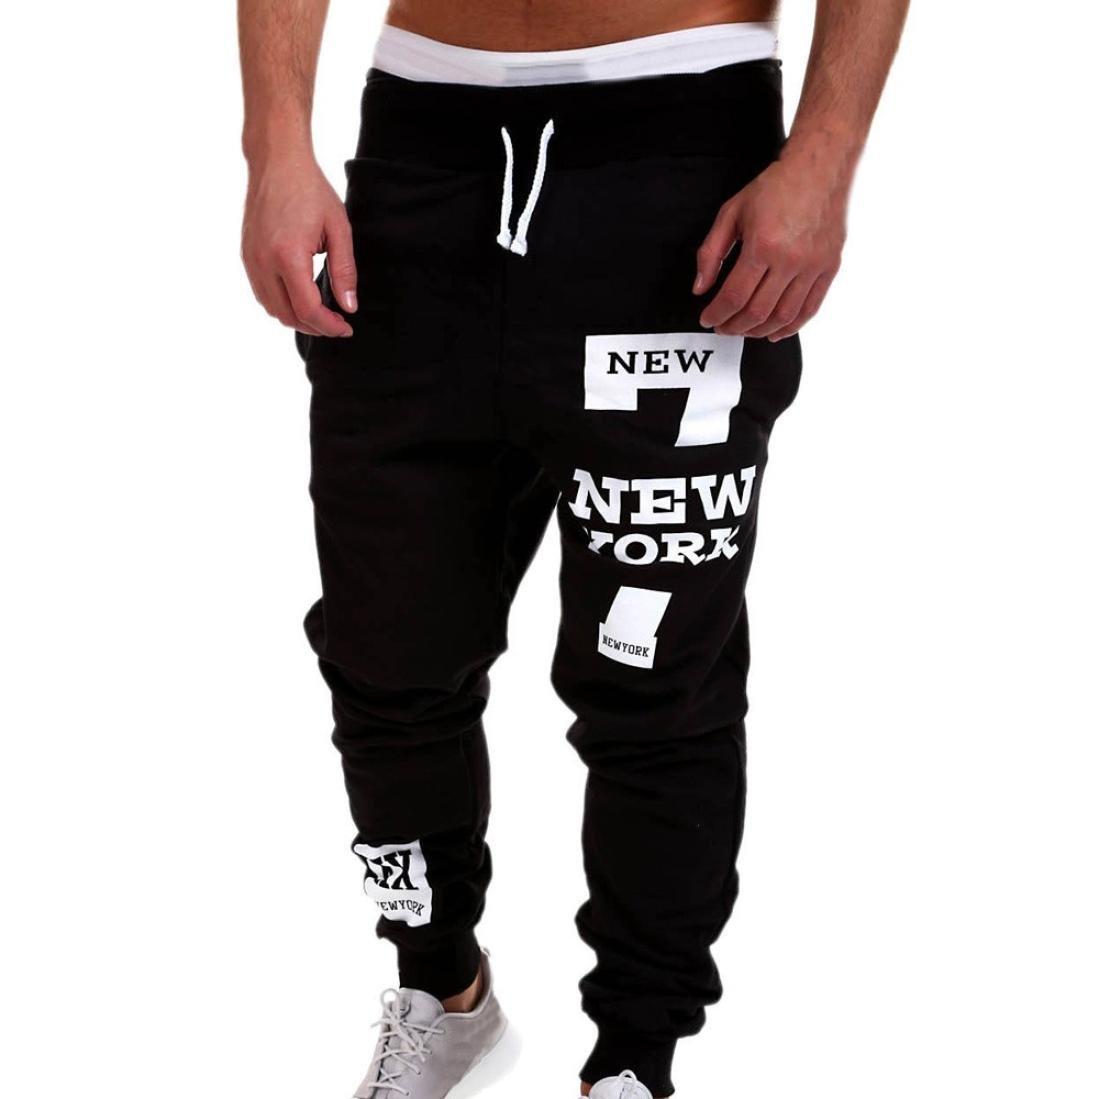 e51de20e8fc ❤️Package include 1PC Mens Pants. ❤️mens pants casual big and tall mens  pants expandable waist mens pants with elastic waist ...